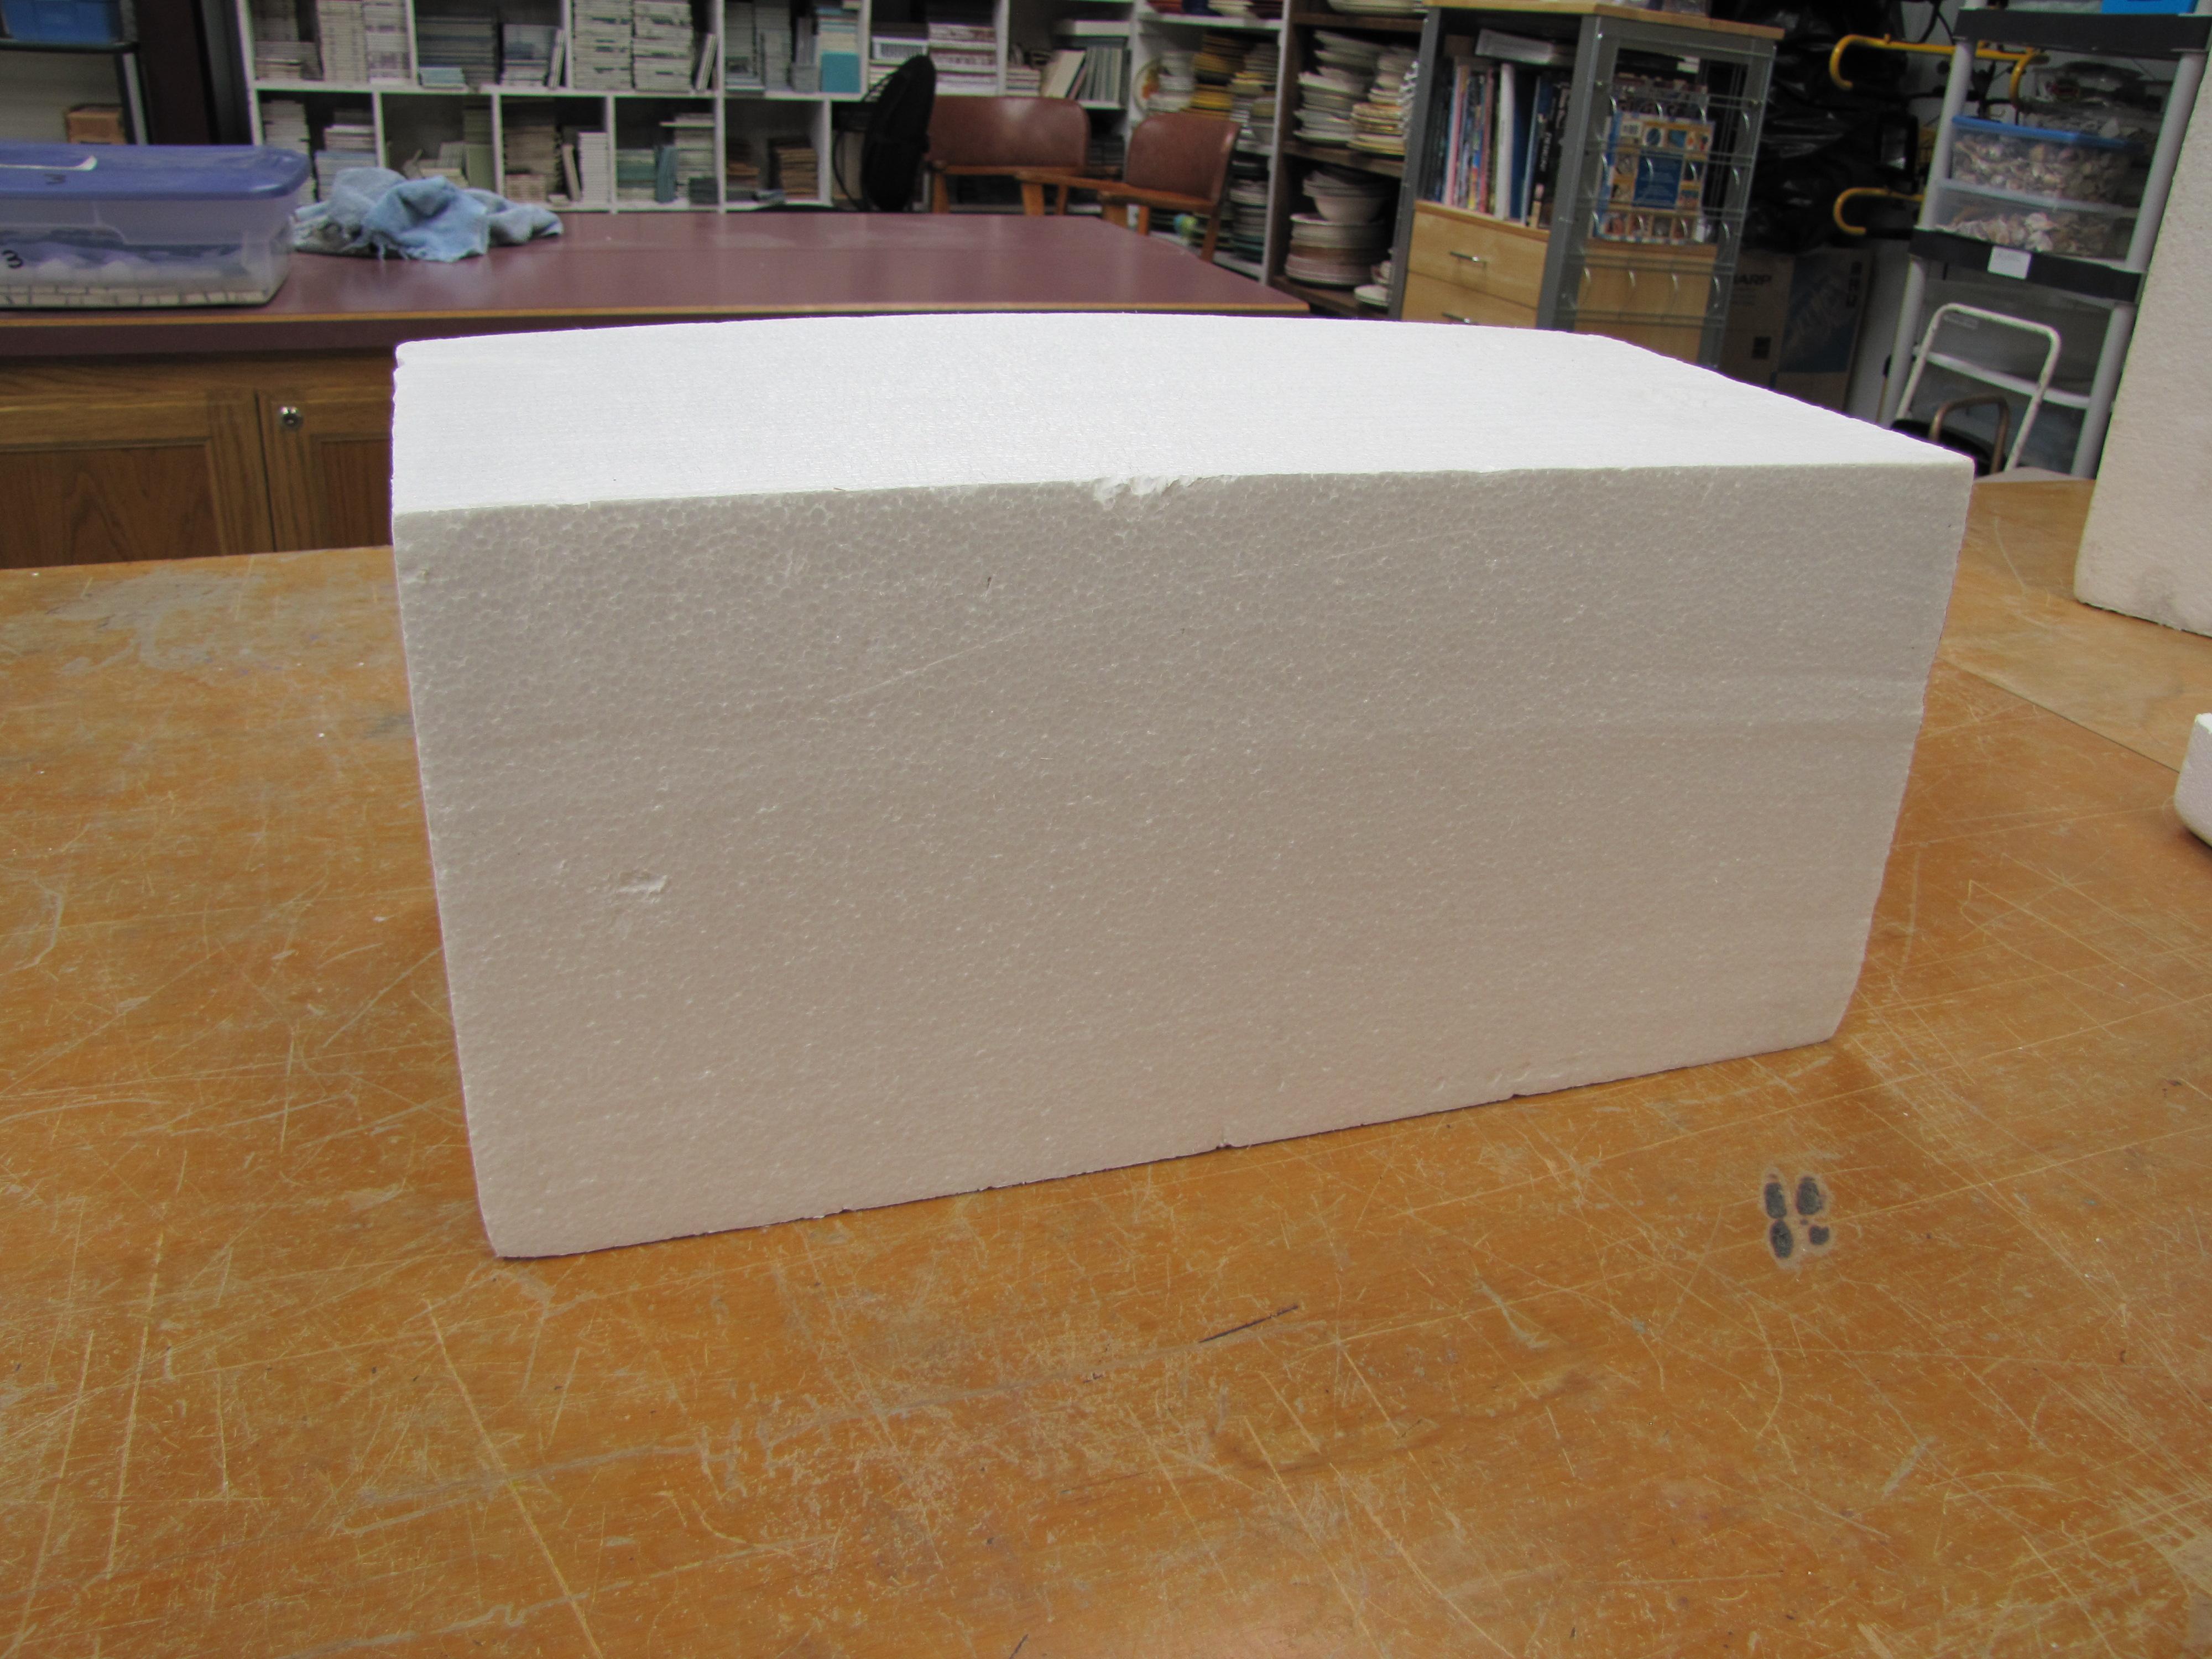 Styrofoam block passiflora mosaics fred donnell for Styrofoam cement blocks